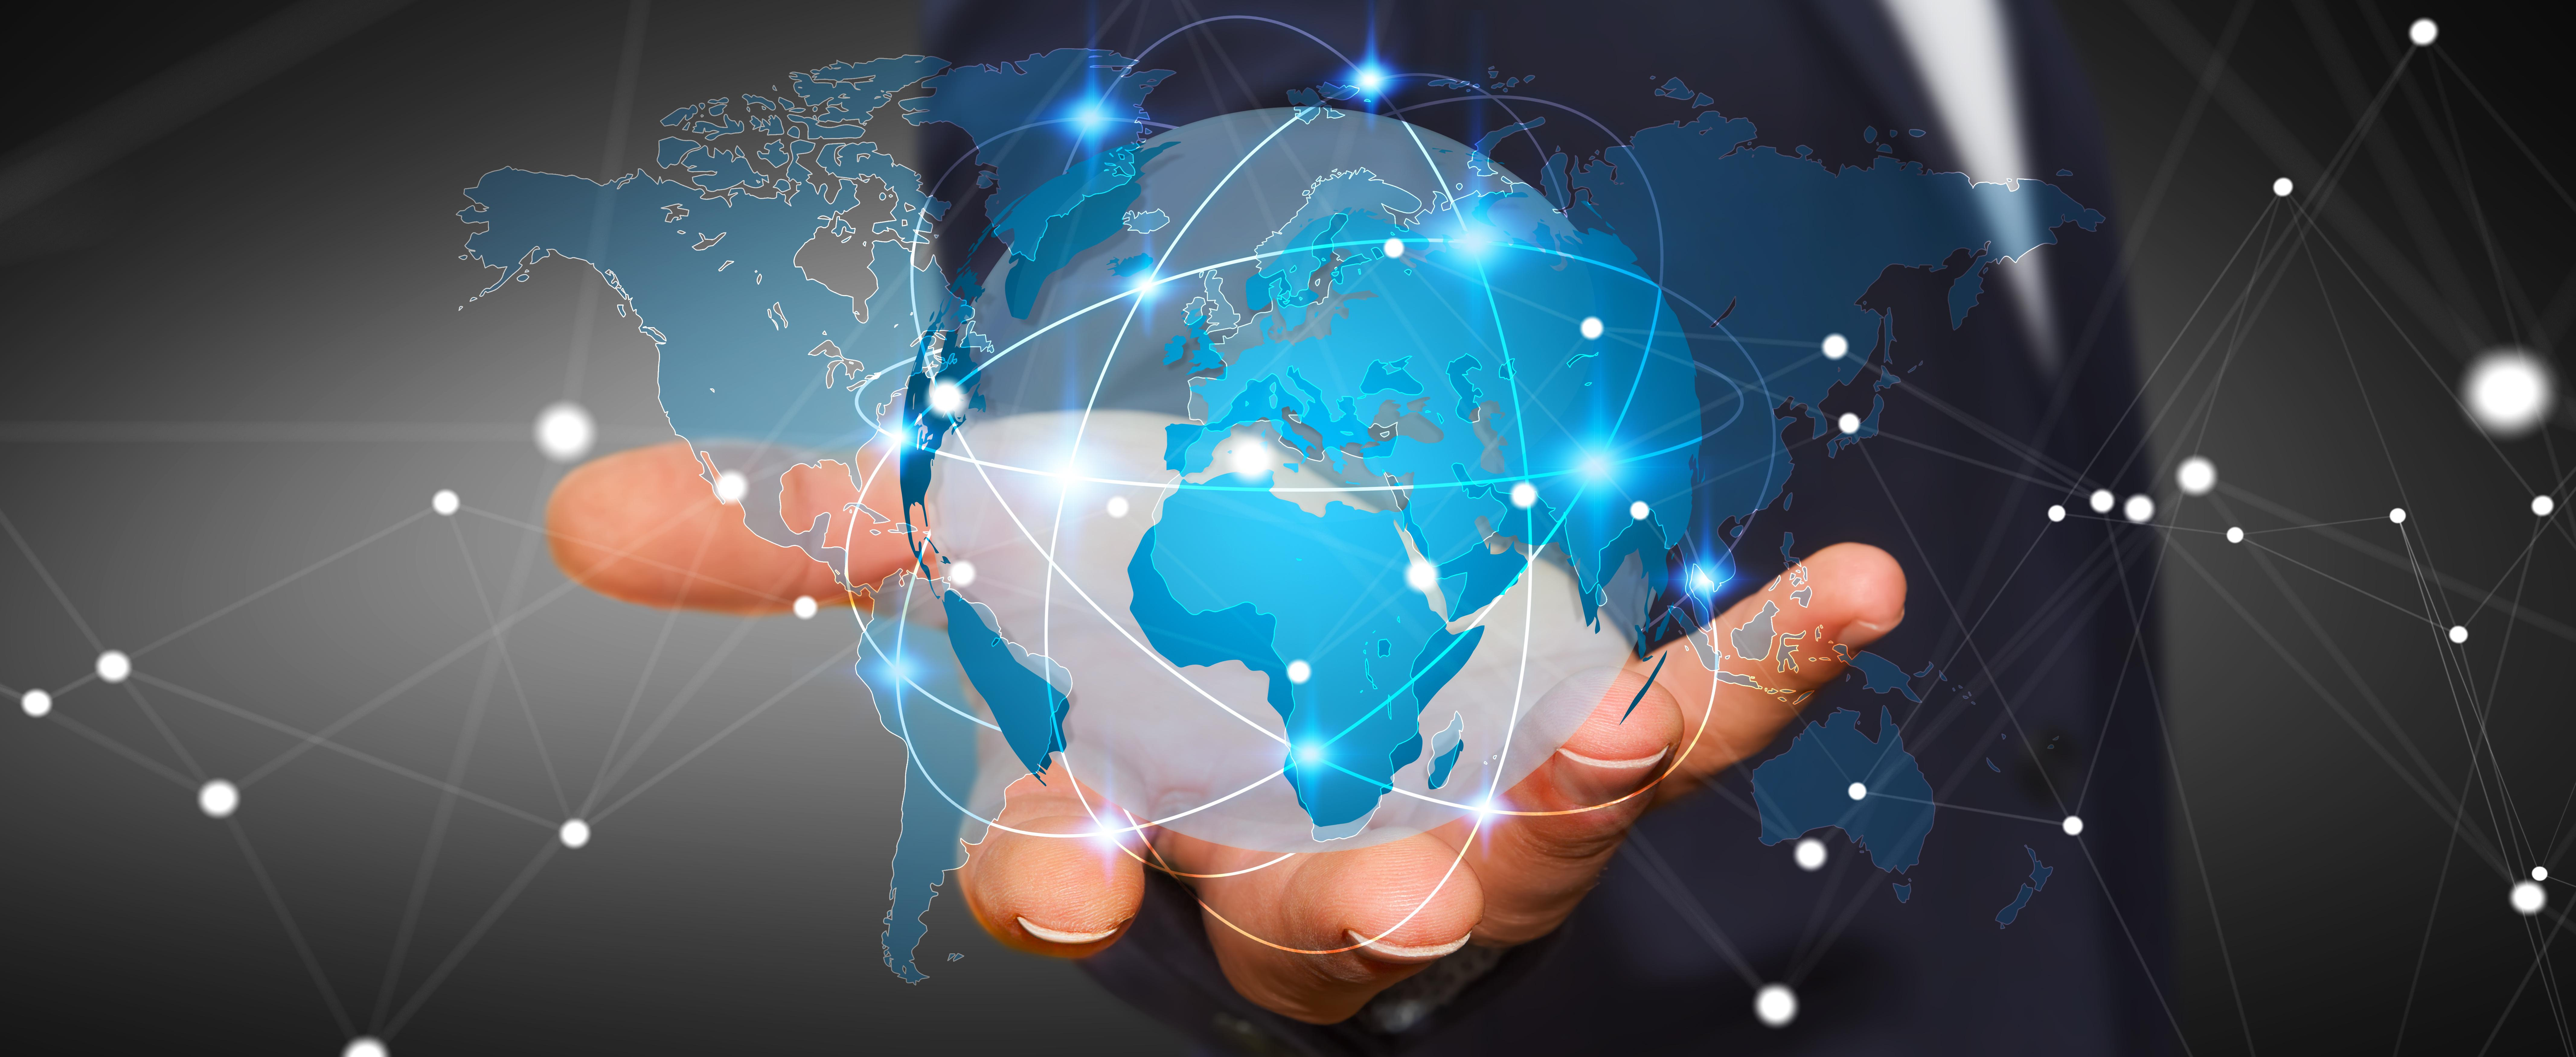 Wholesale Voice Carrier Services, Data, & Unified Communications